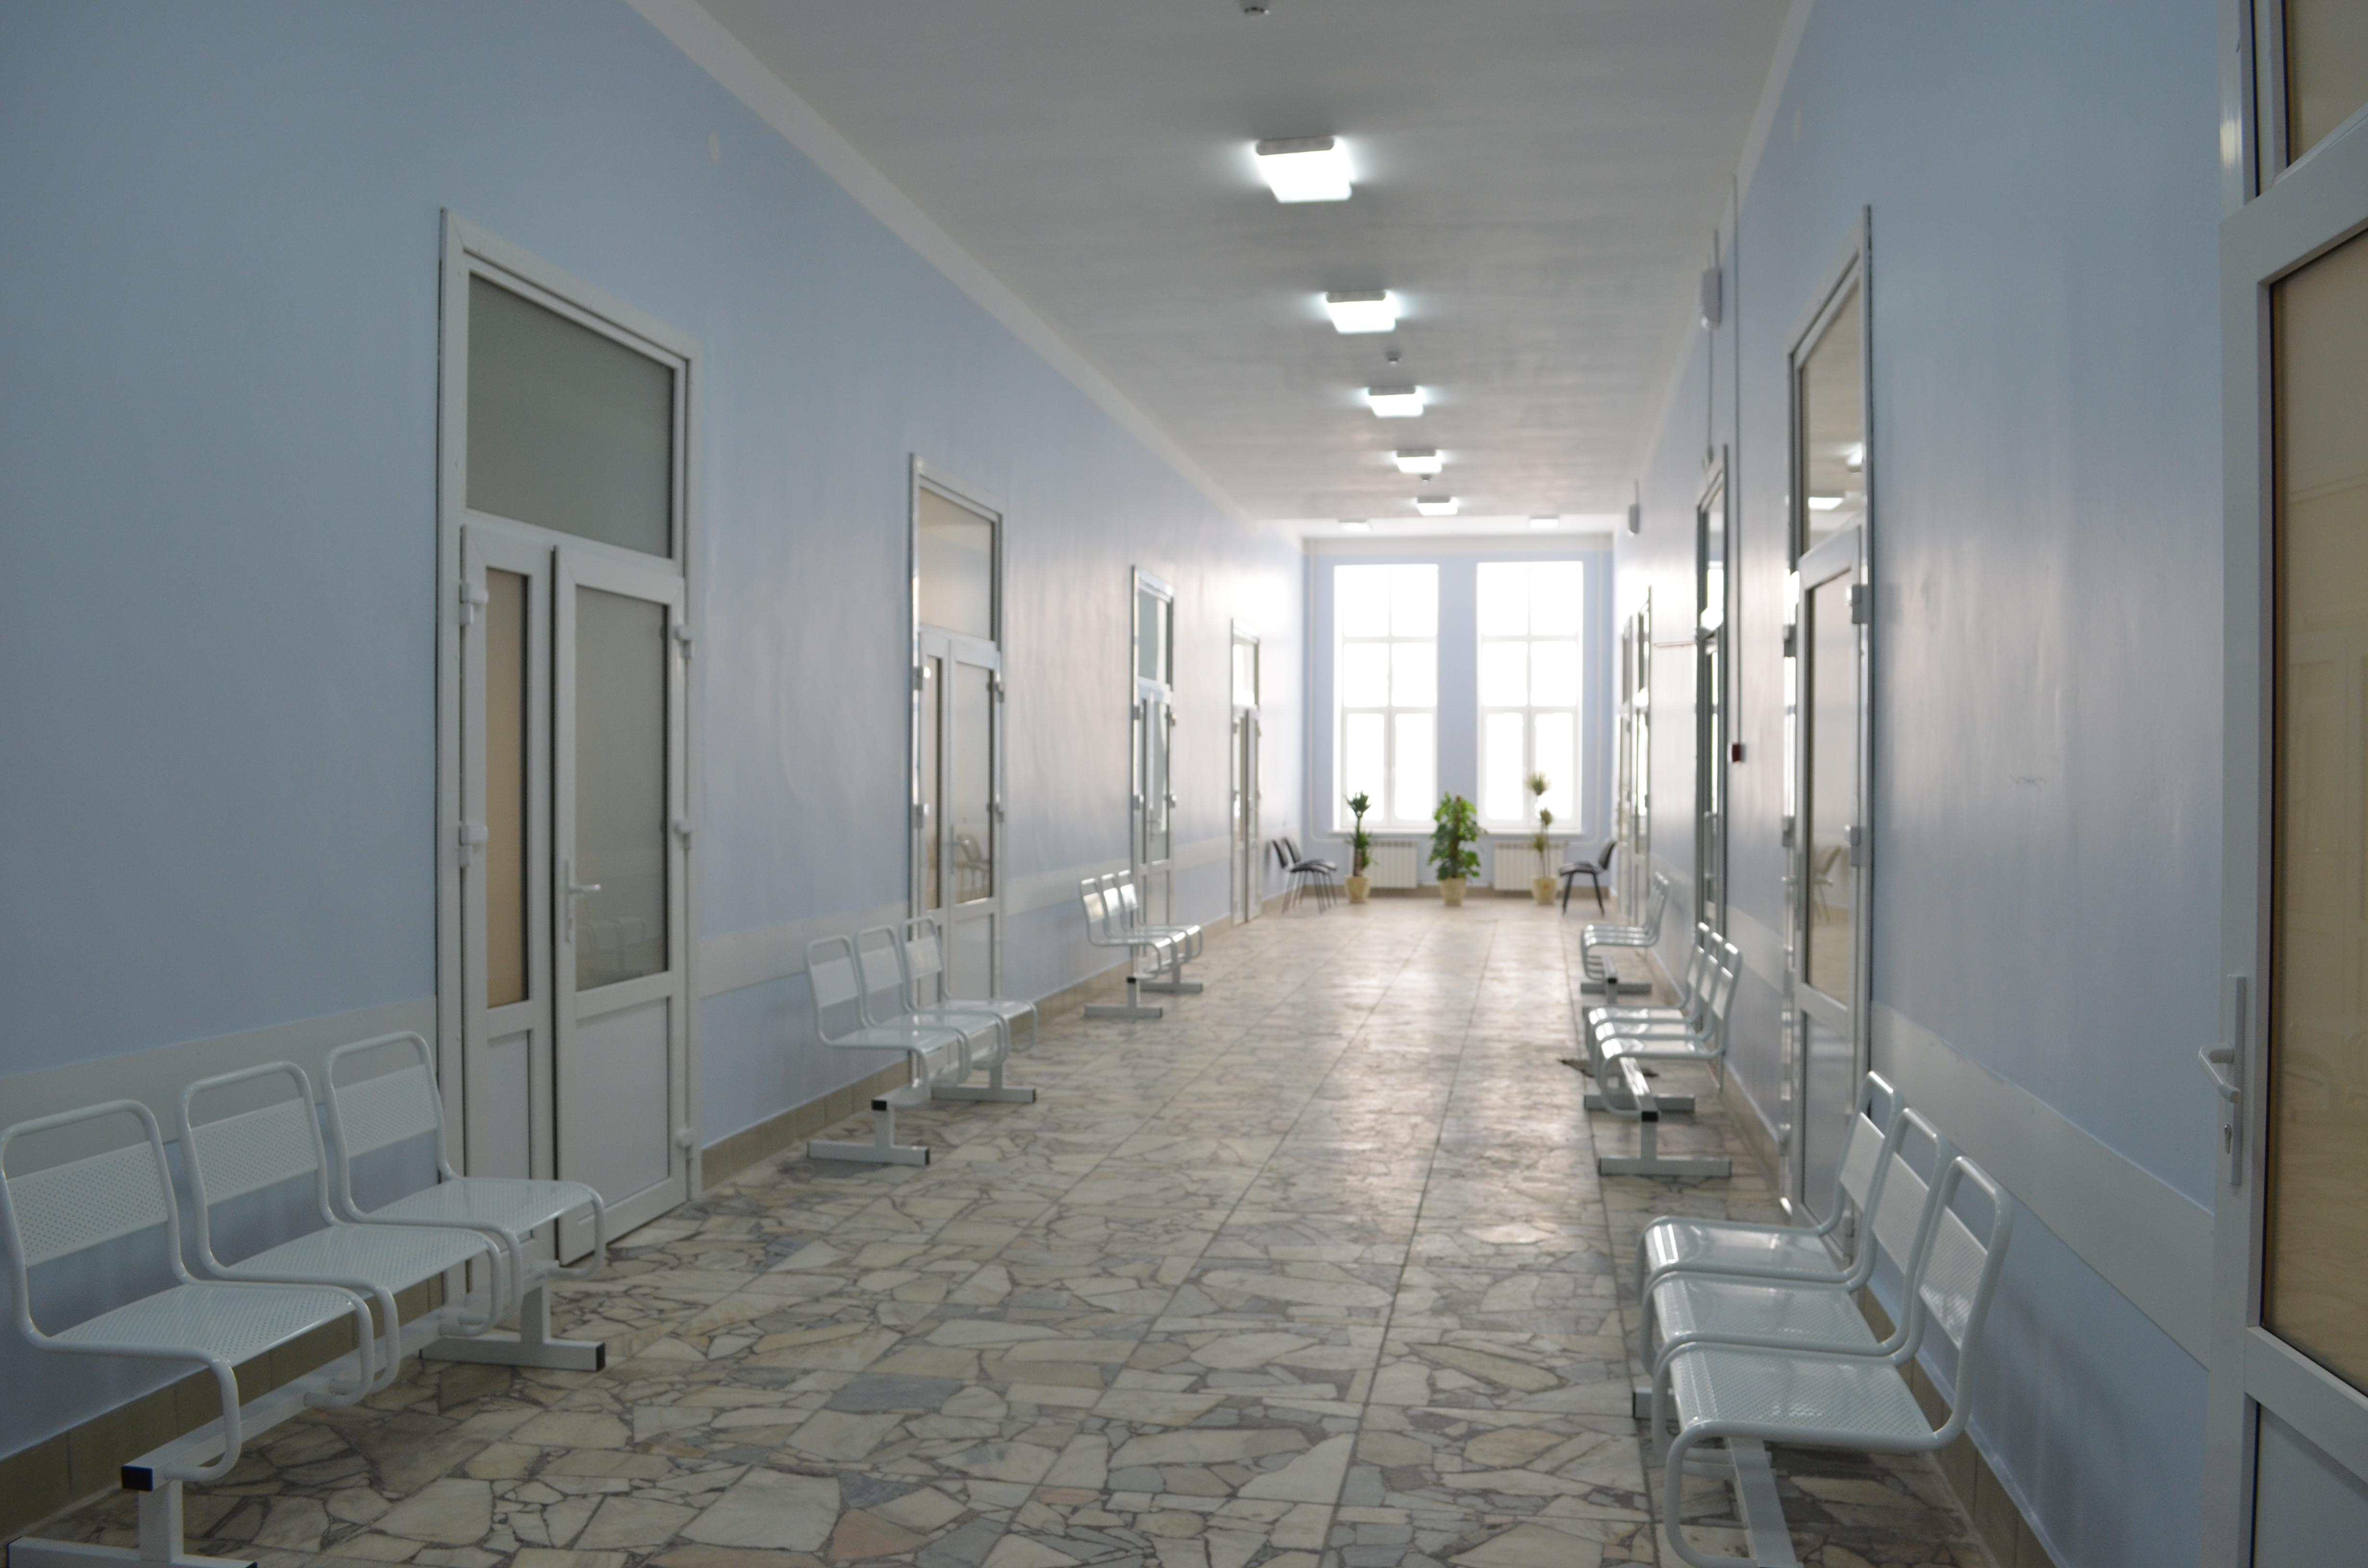 Оператор колл центра медицинского центра